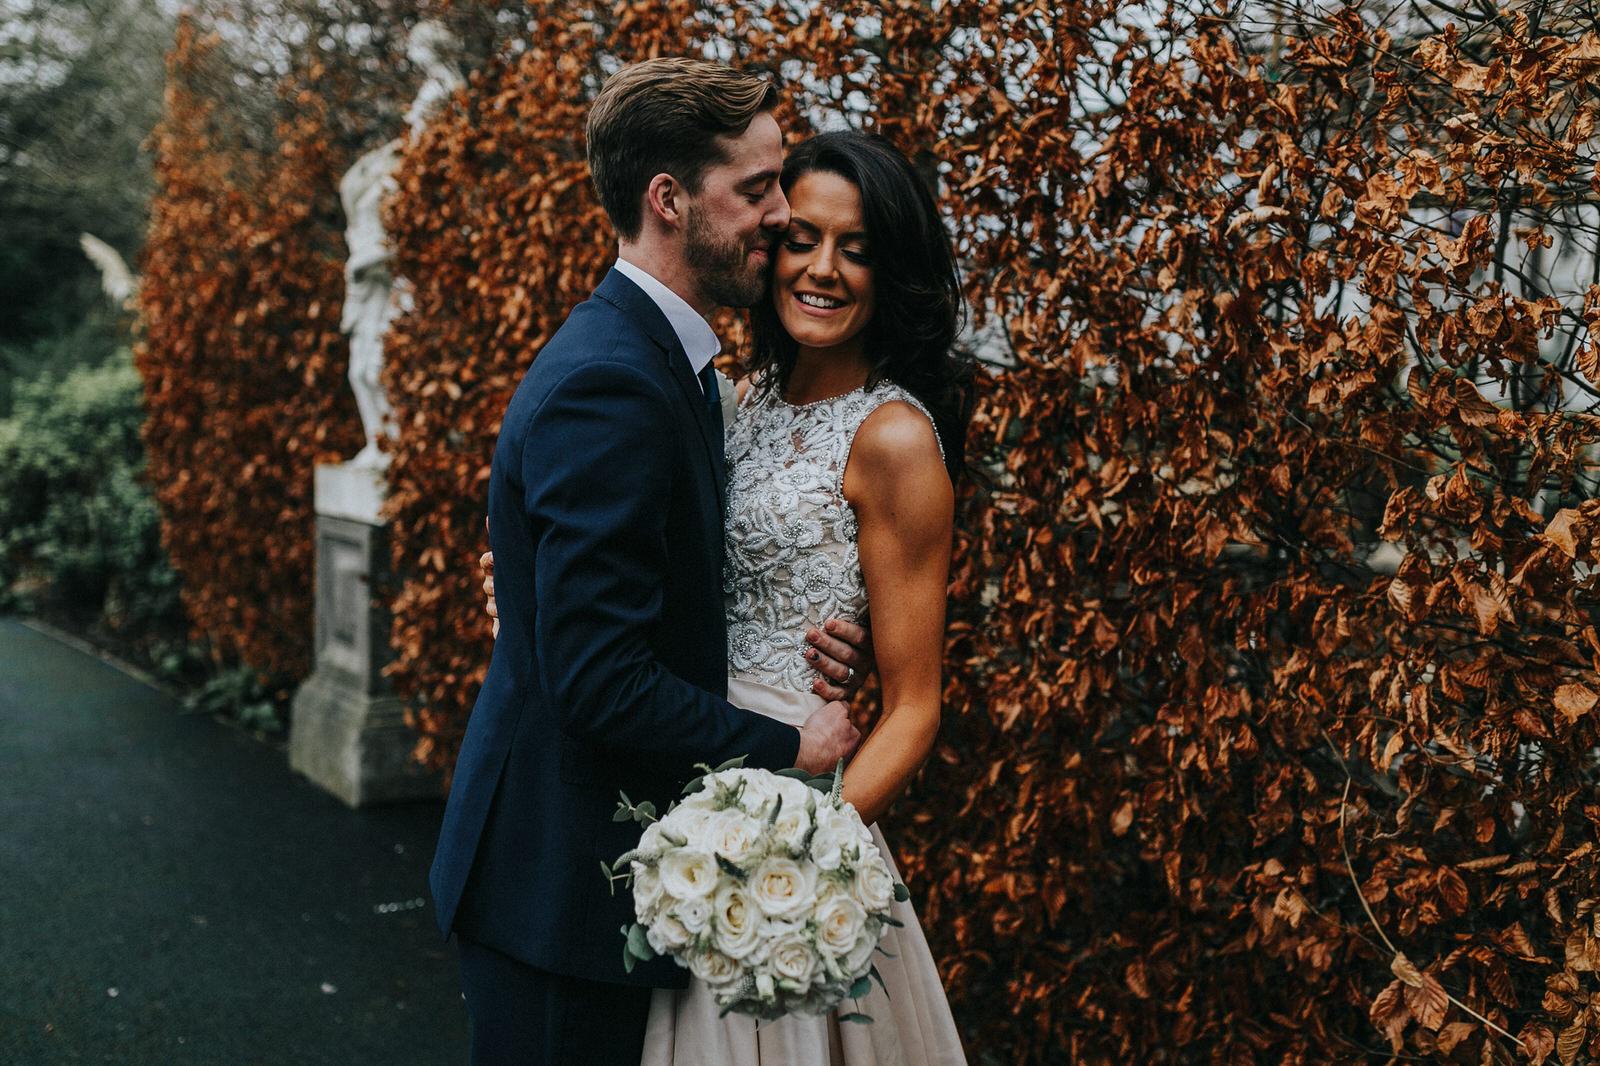 Roger_Kenny_wedding_photographer_458.jpg